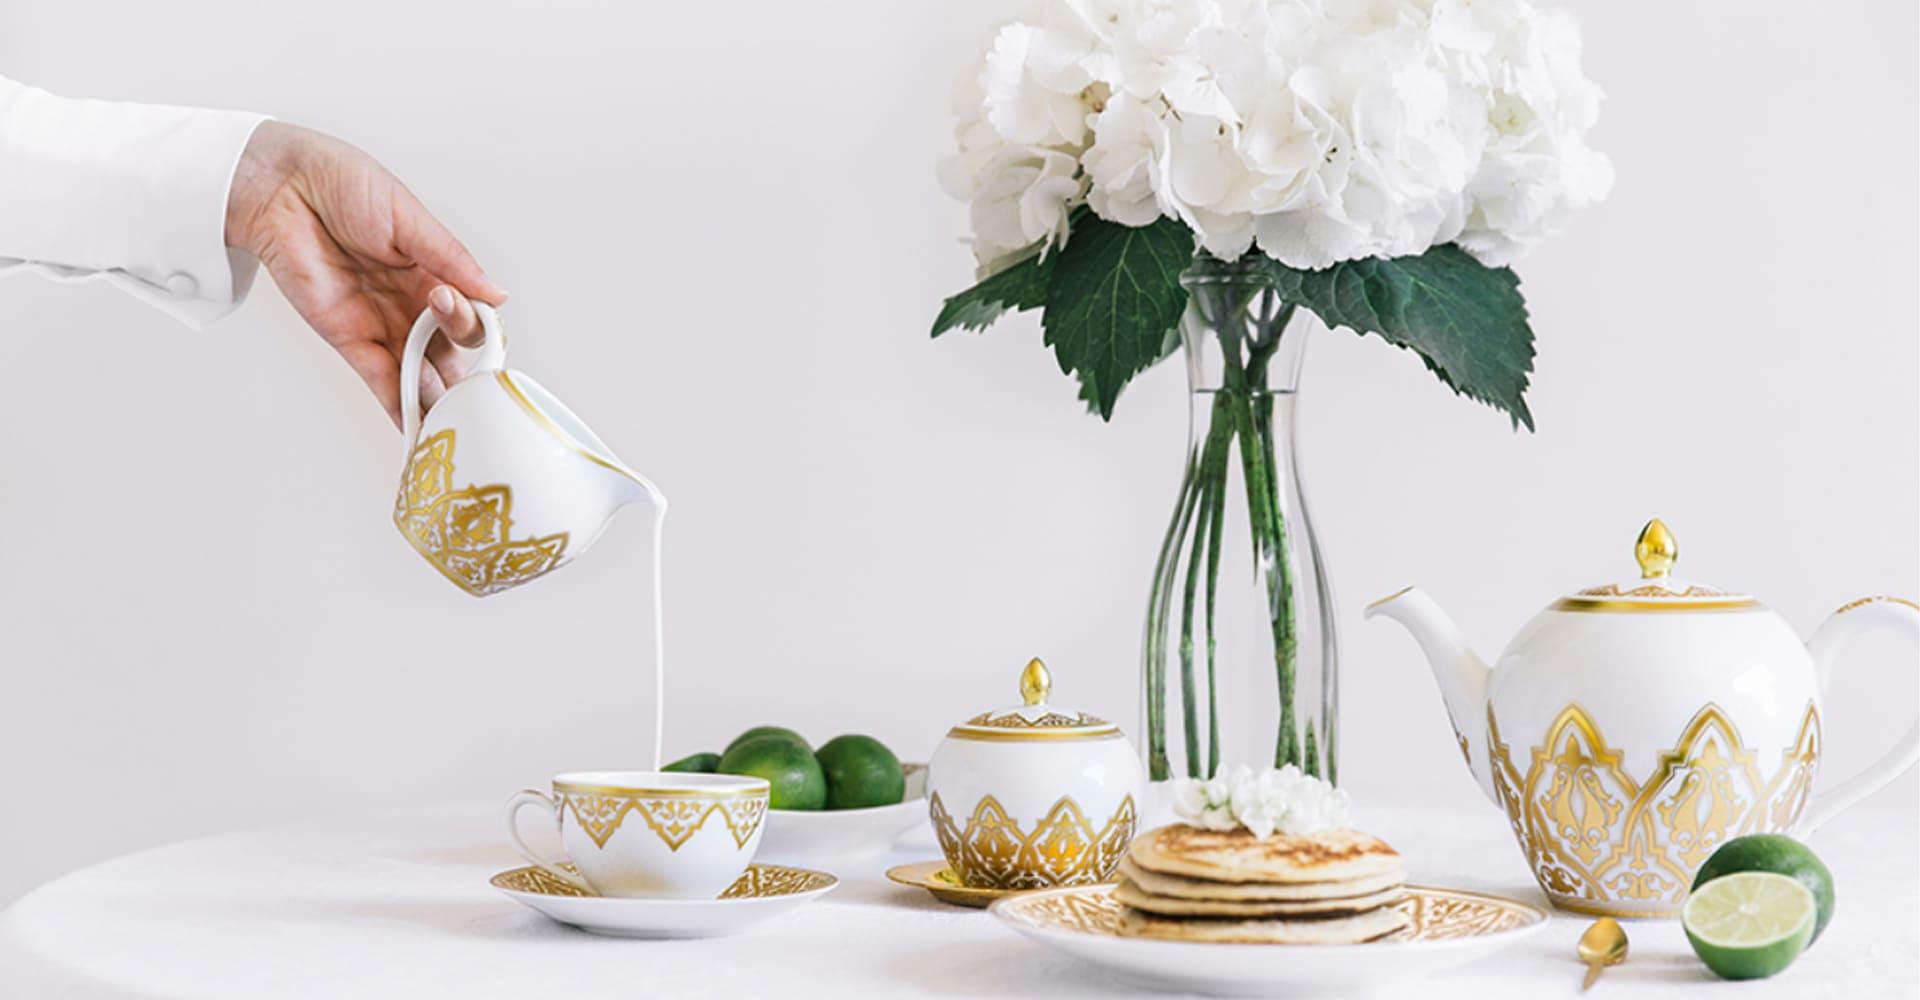 Servizio di piatti in porcellana di Limoges Bernardaud